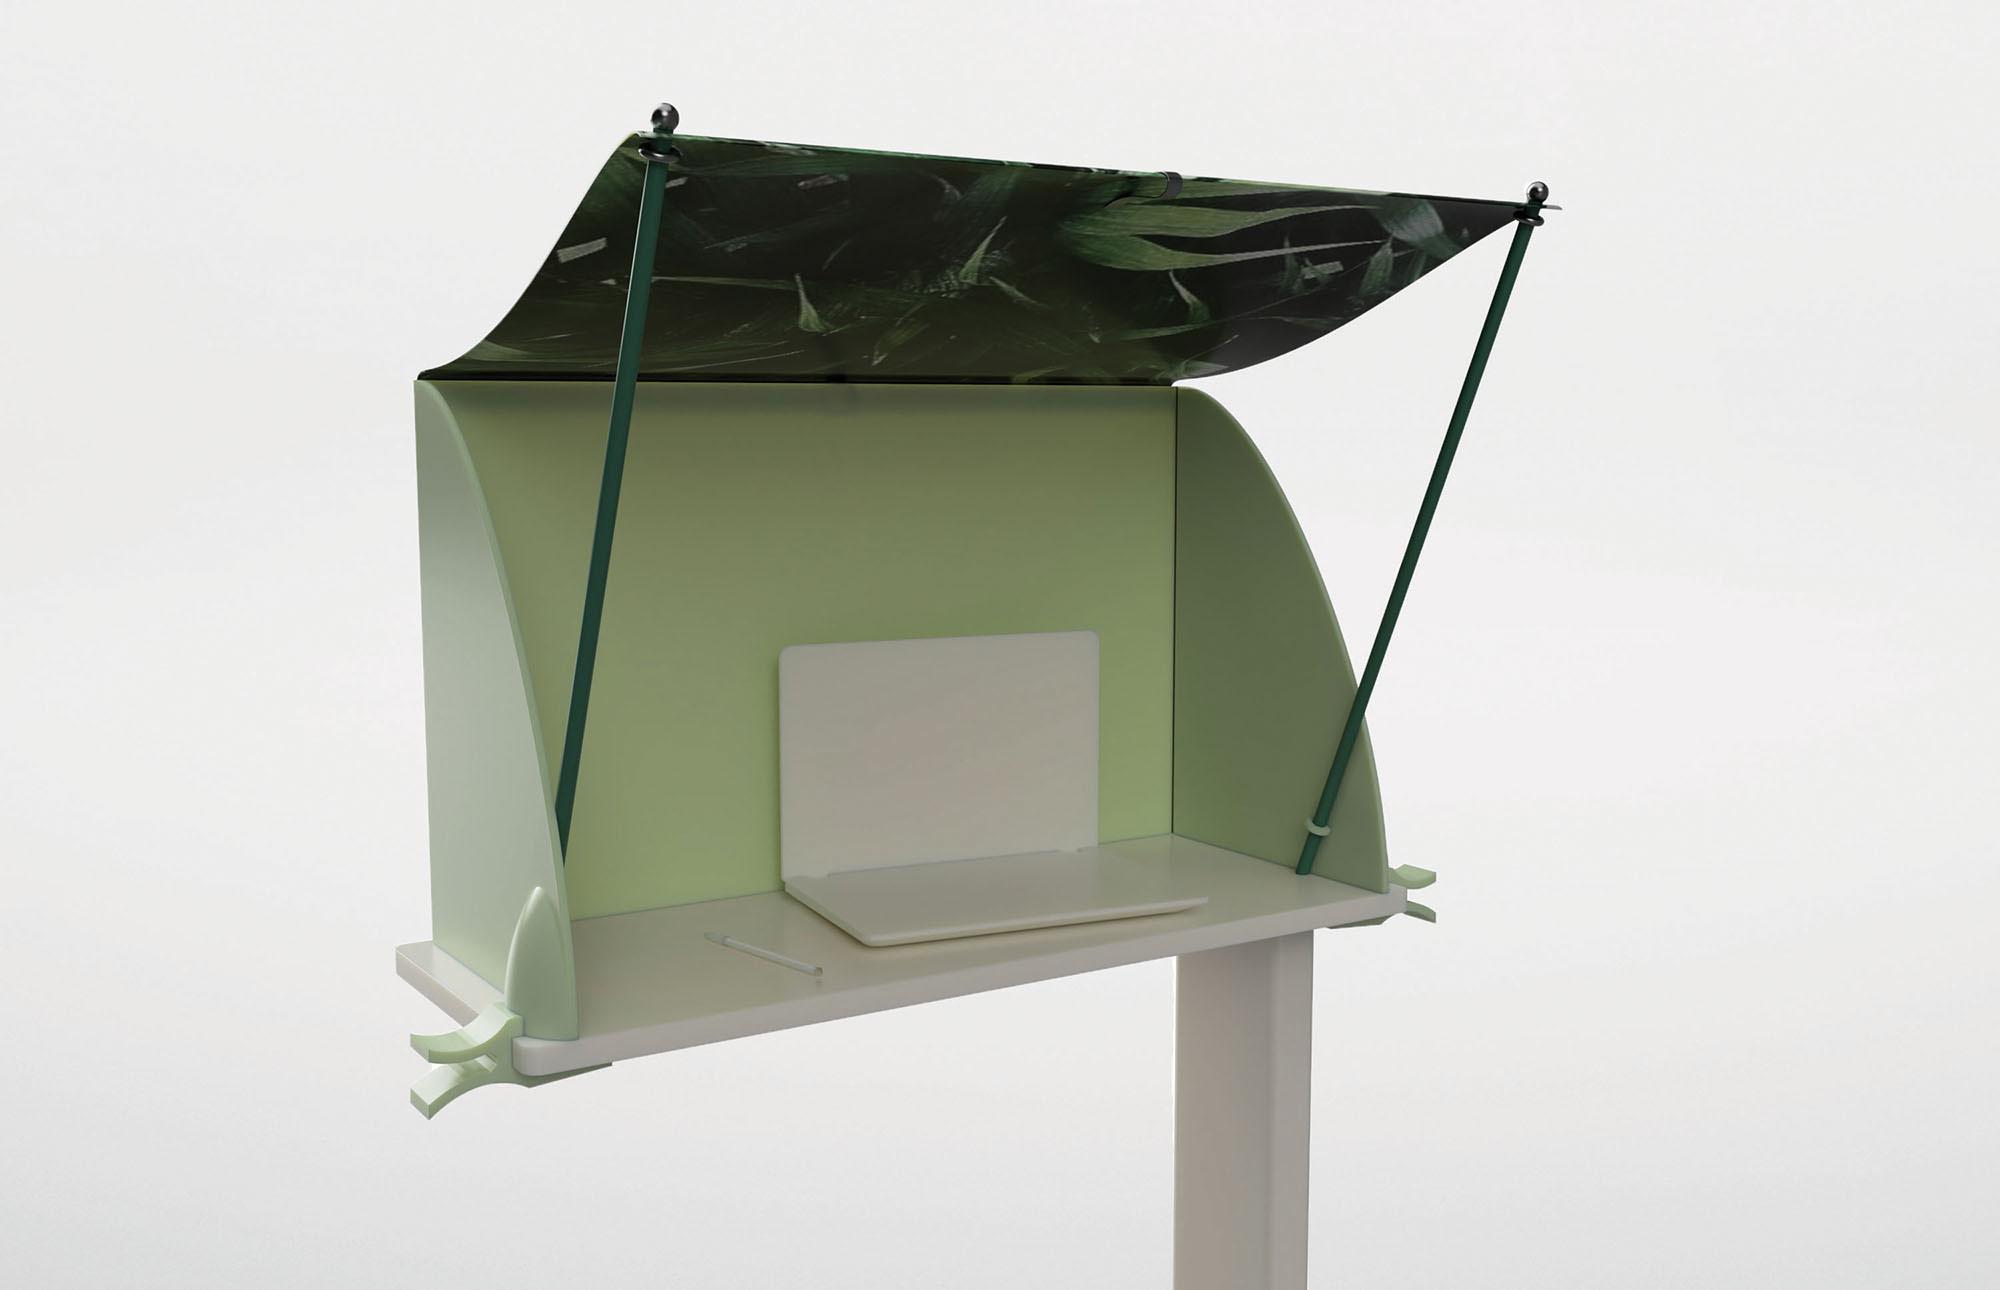 BloemenTrina-Tent-2 - Trina Bloemen.jpg